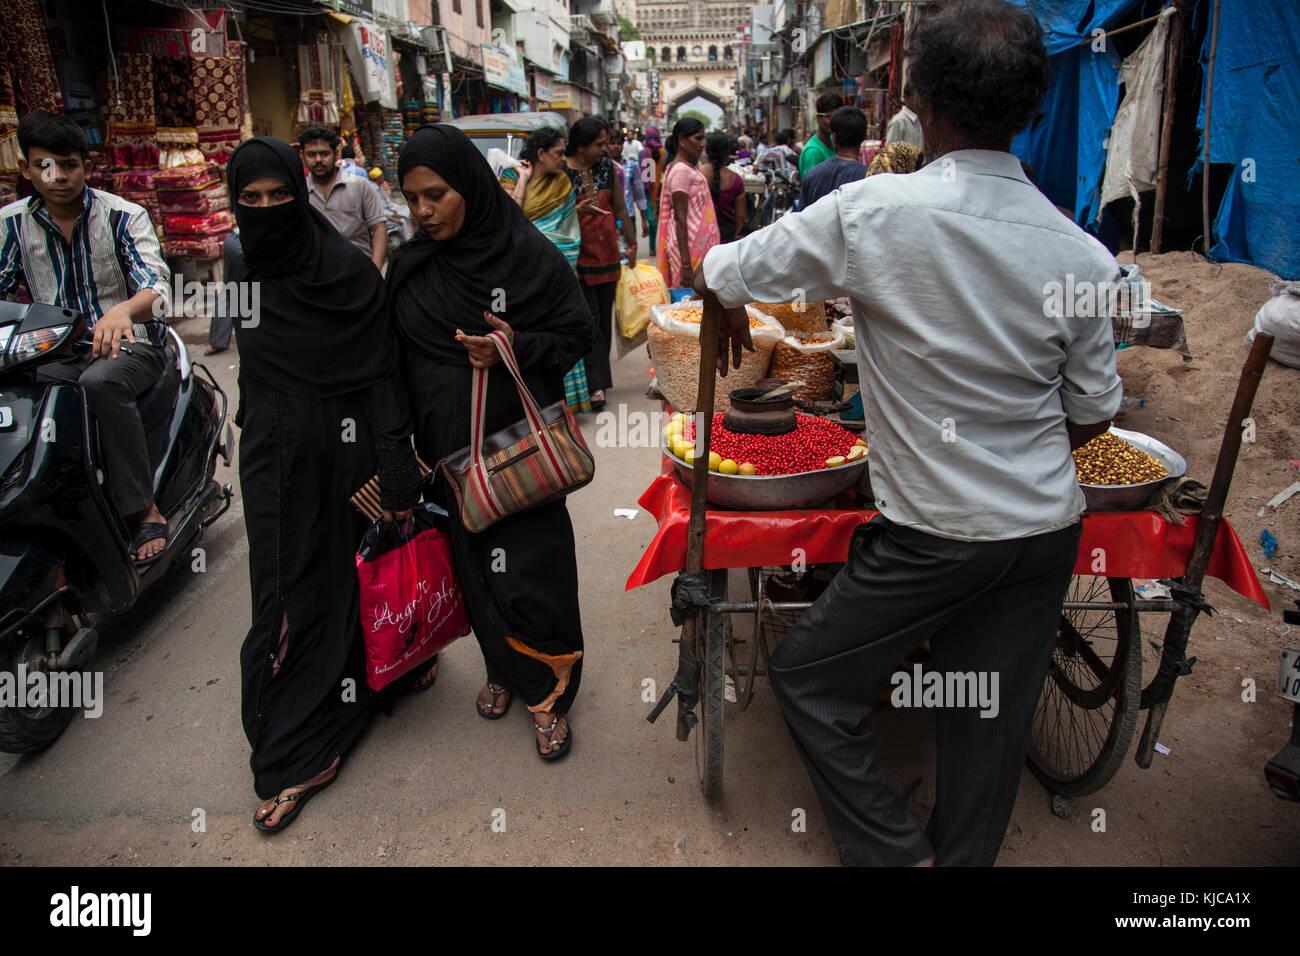 Muslim woman walk along the Charminar Bizzaar in Hyderabad, India. - Stock Image